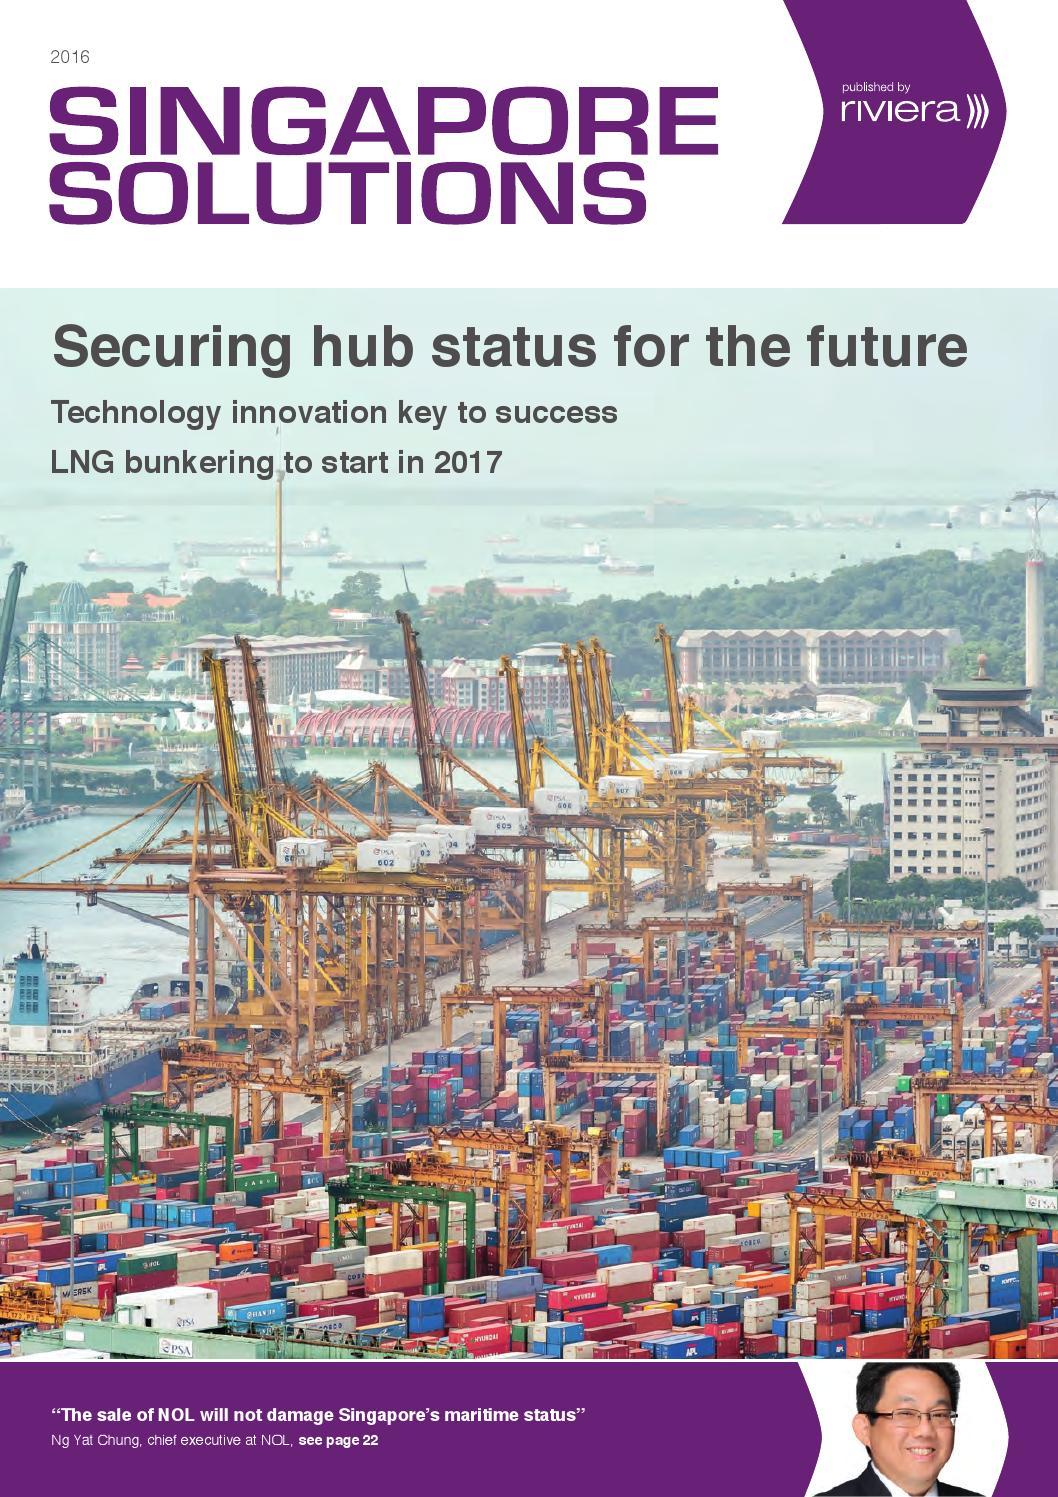 Singapore Solutions 2016 by rivieramaritimemedia - issuu